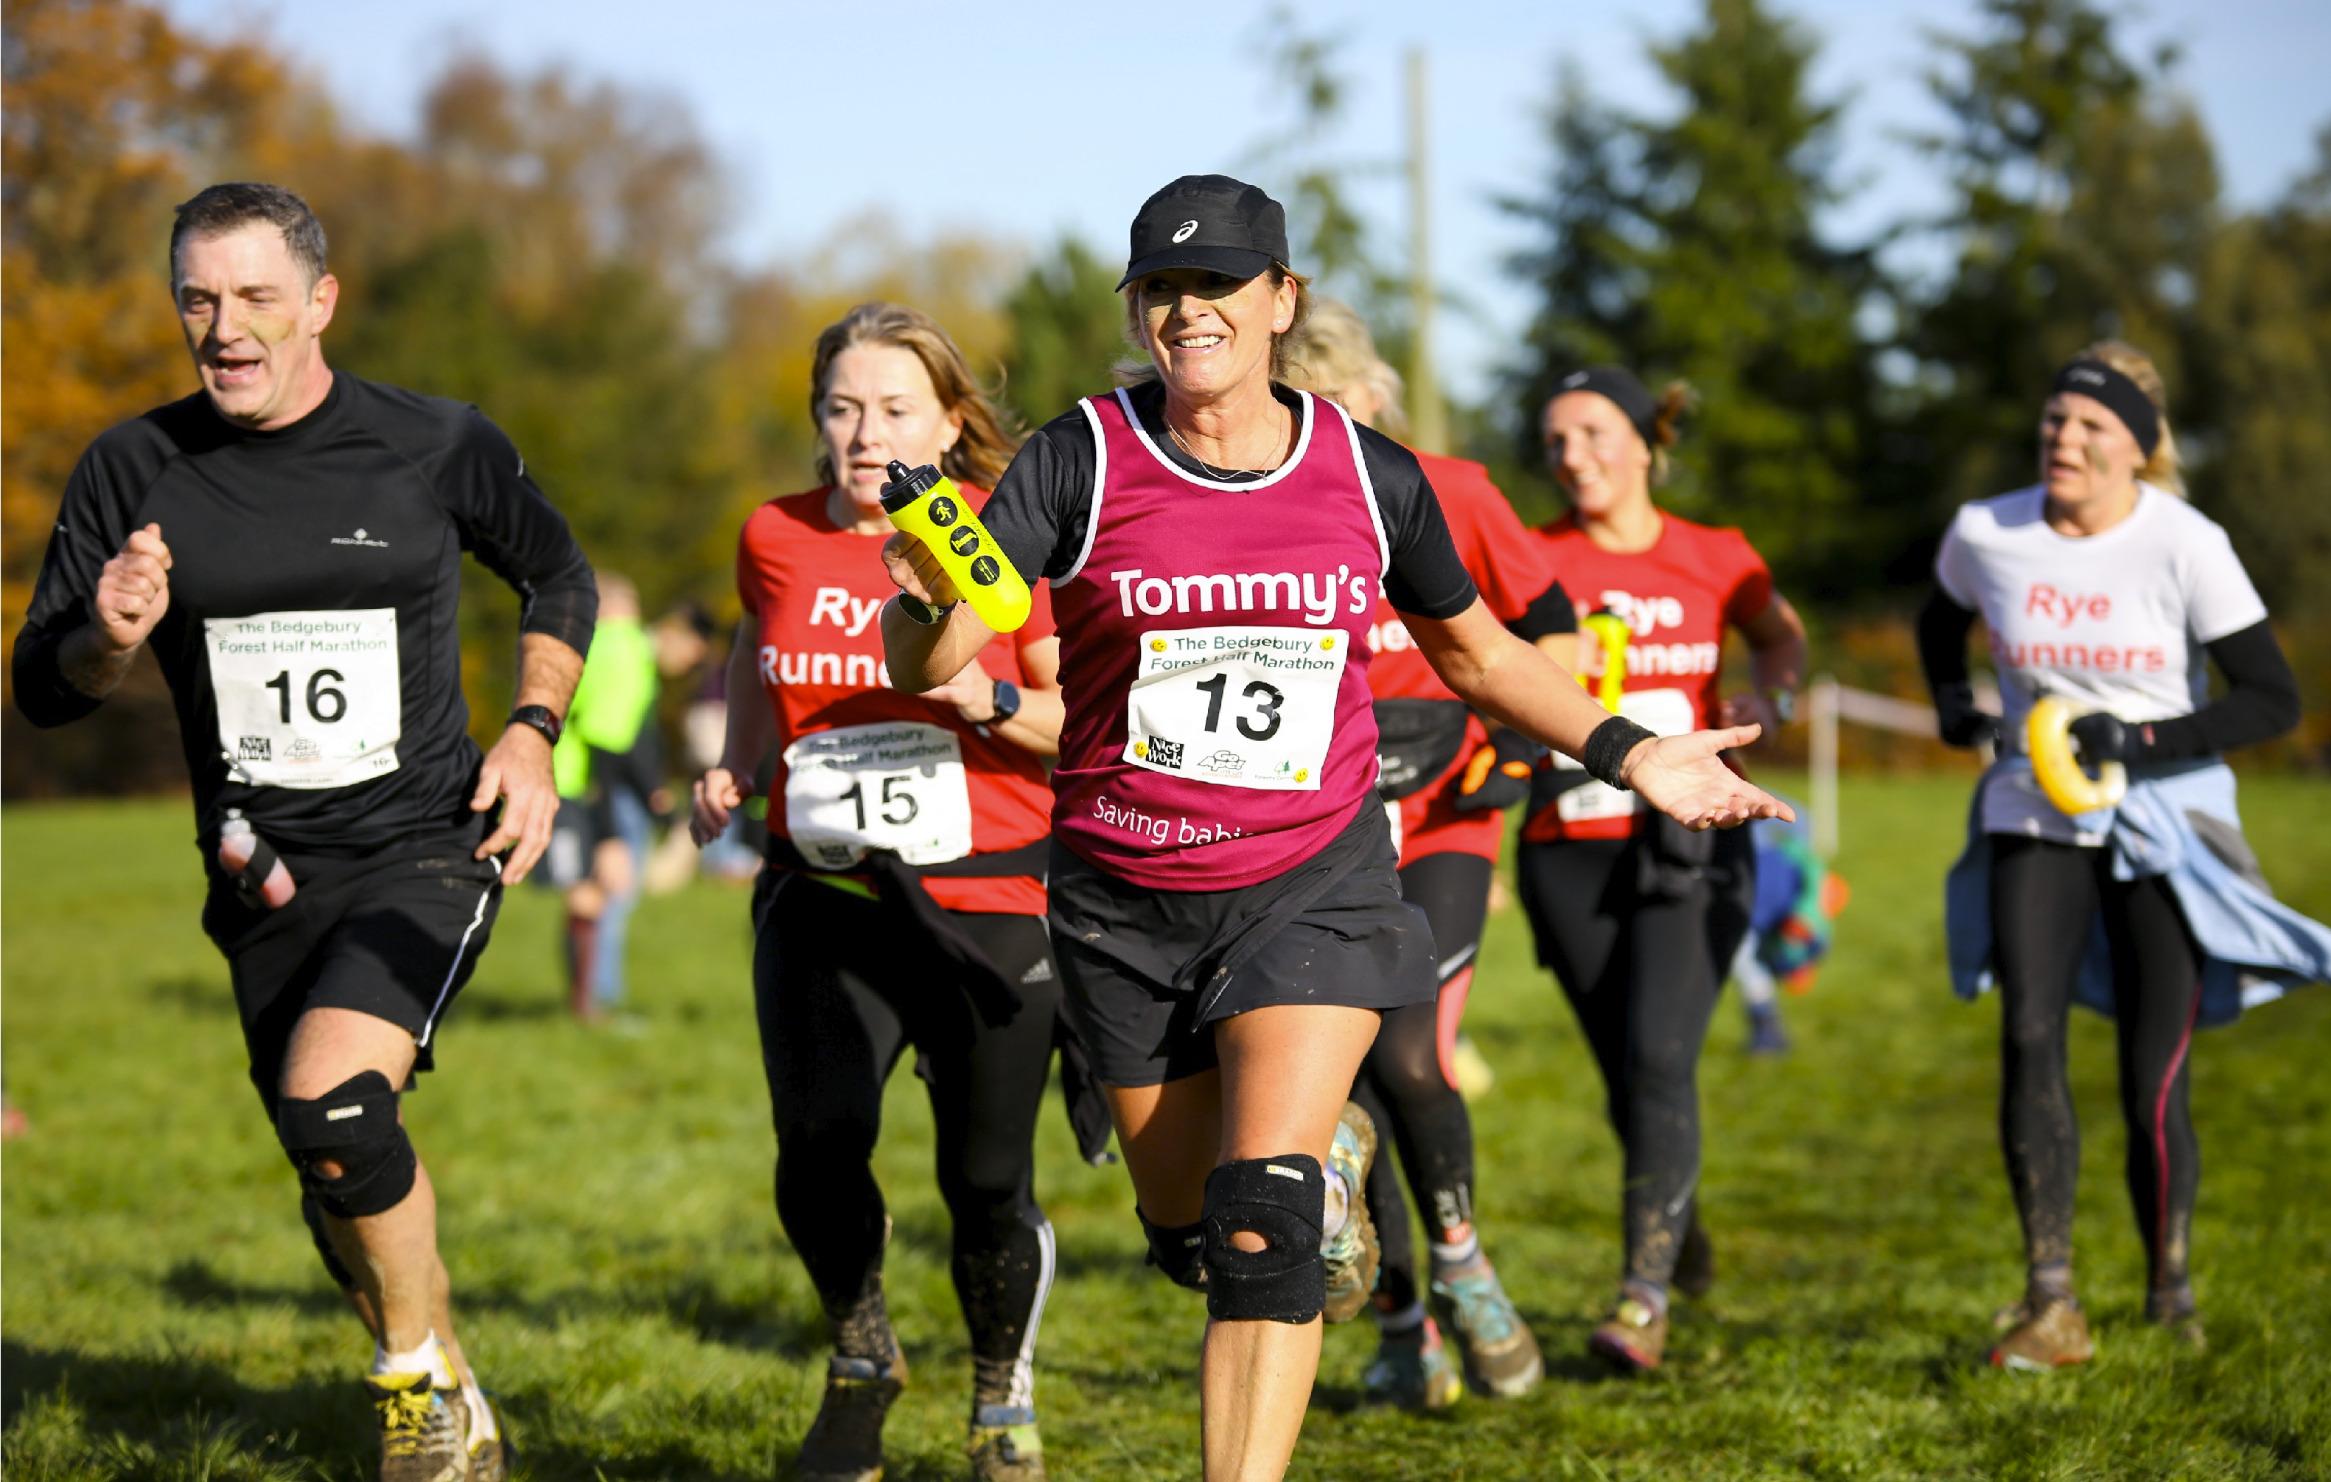 The Bedgebury Forest Half Marathon \u0026 10K - cover image